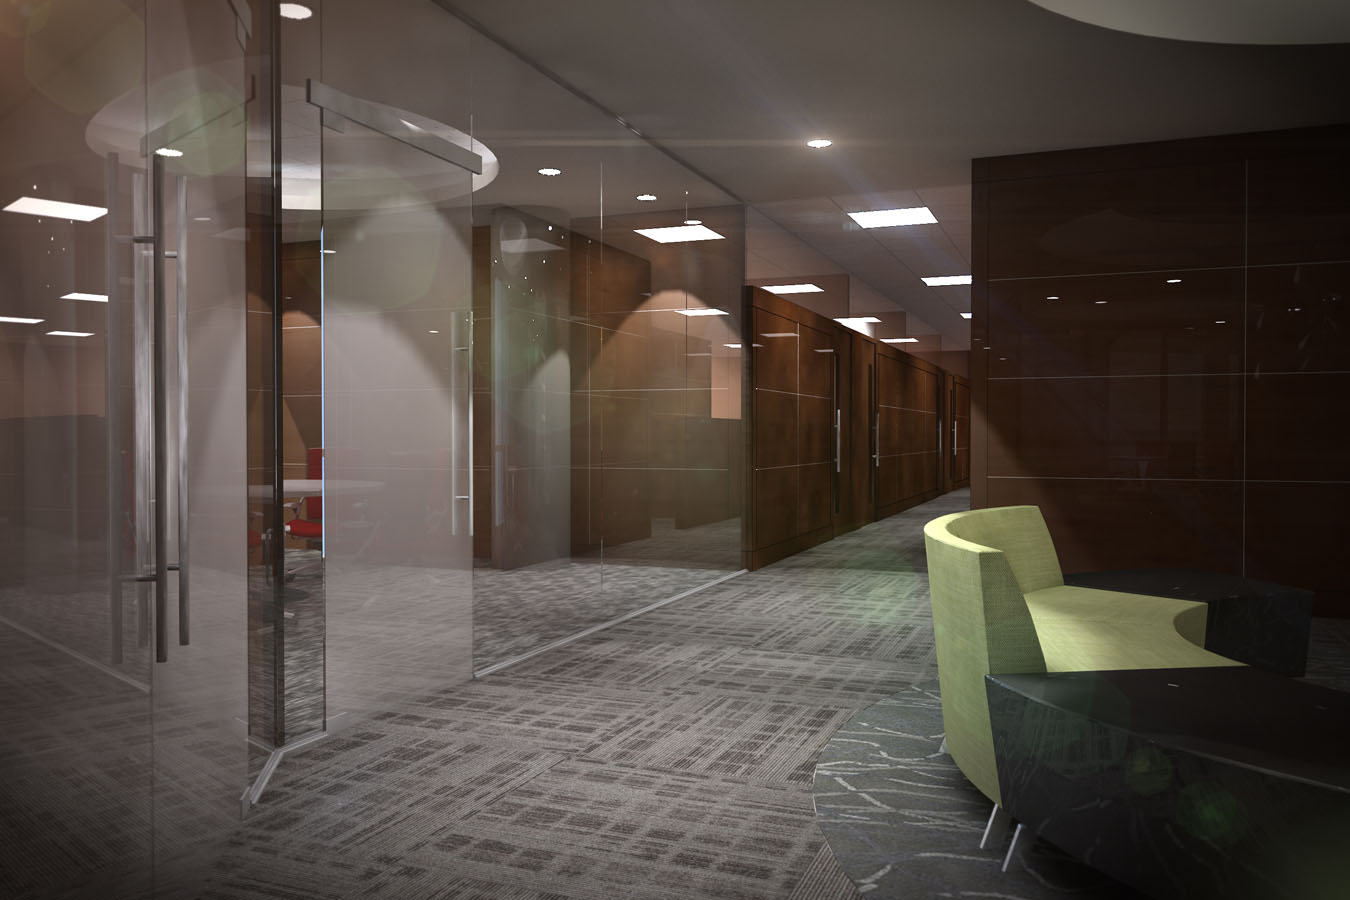 Wichita's largest law firms - Wichita Business Journal